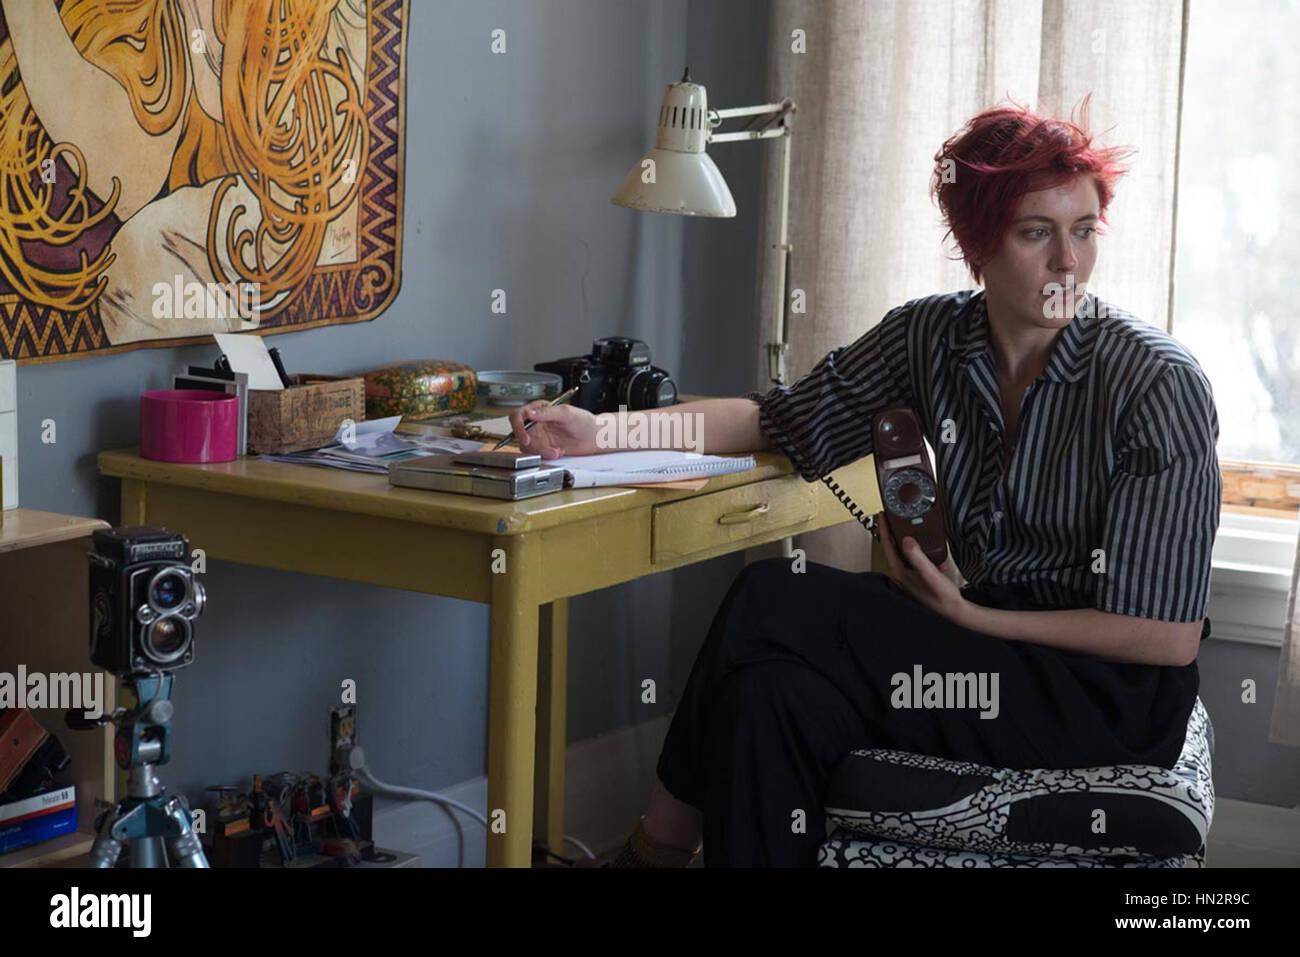 Xx secolo le donne (2016) greta gerwig Mike Mills (dir) annapurna pictures/raccolta moviestore ltd Immagini Stock